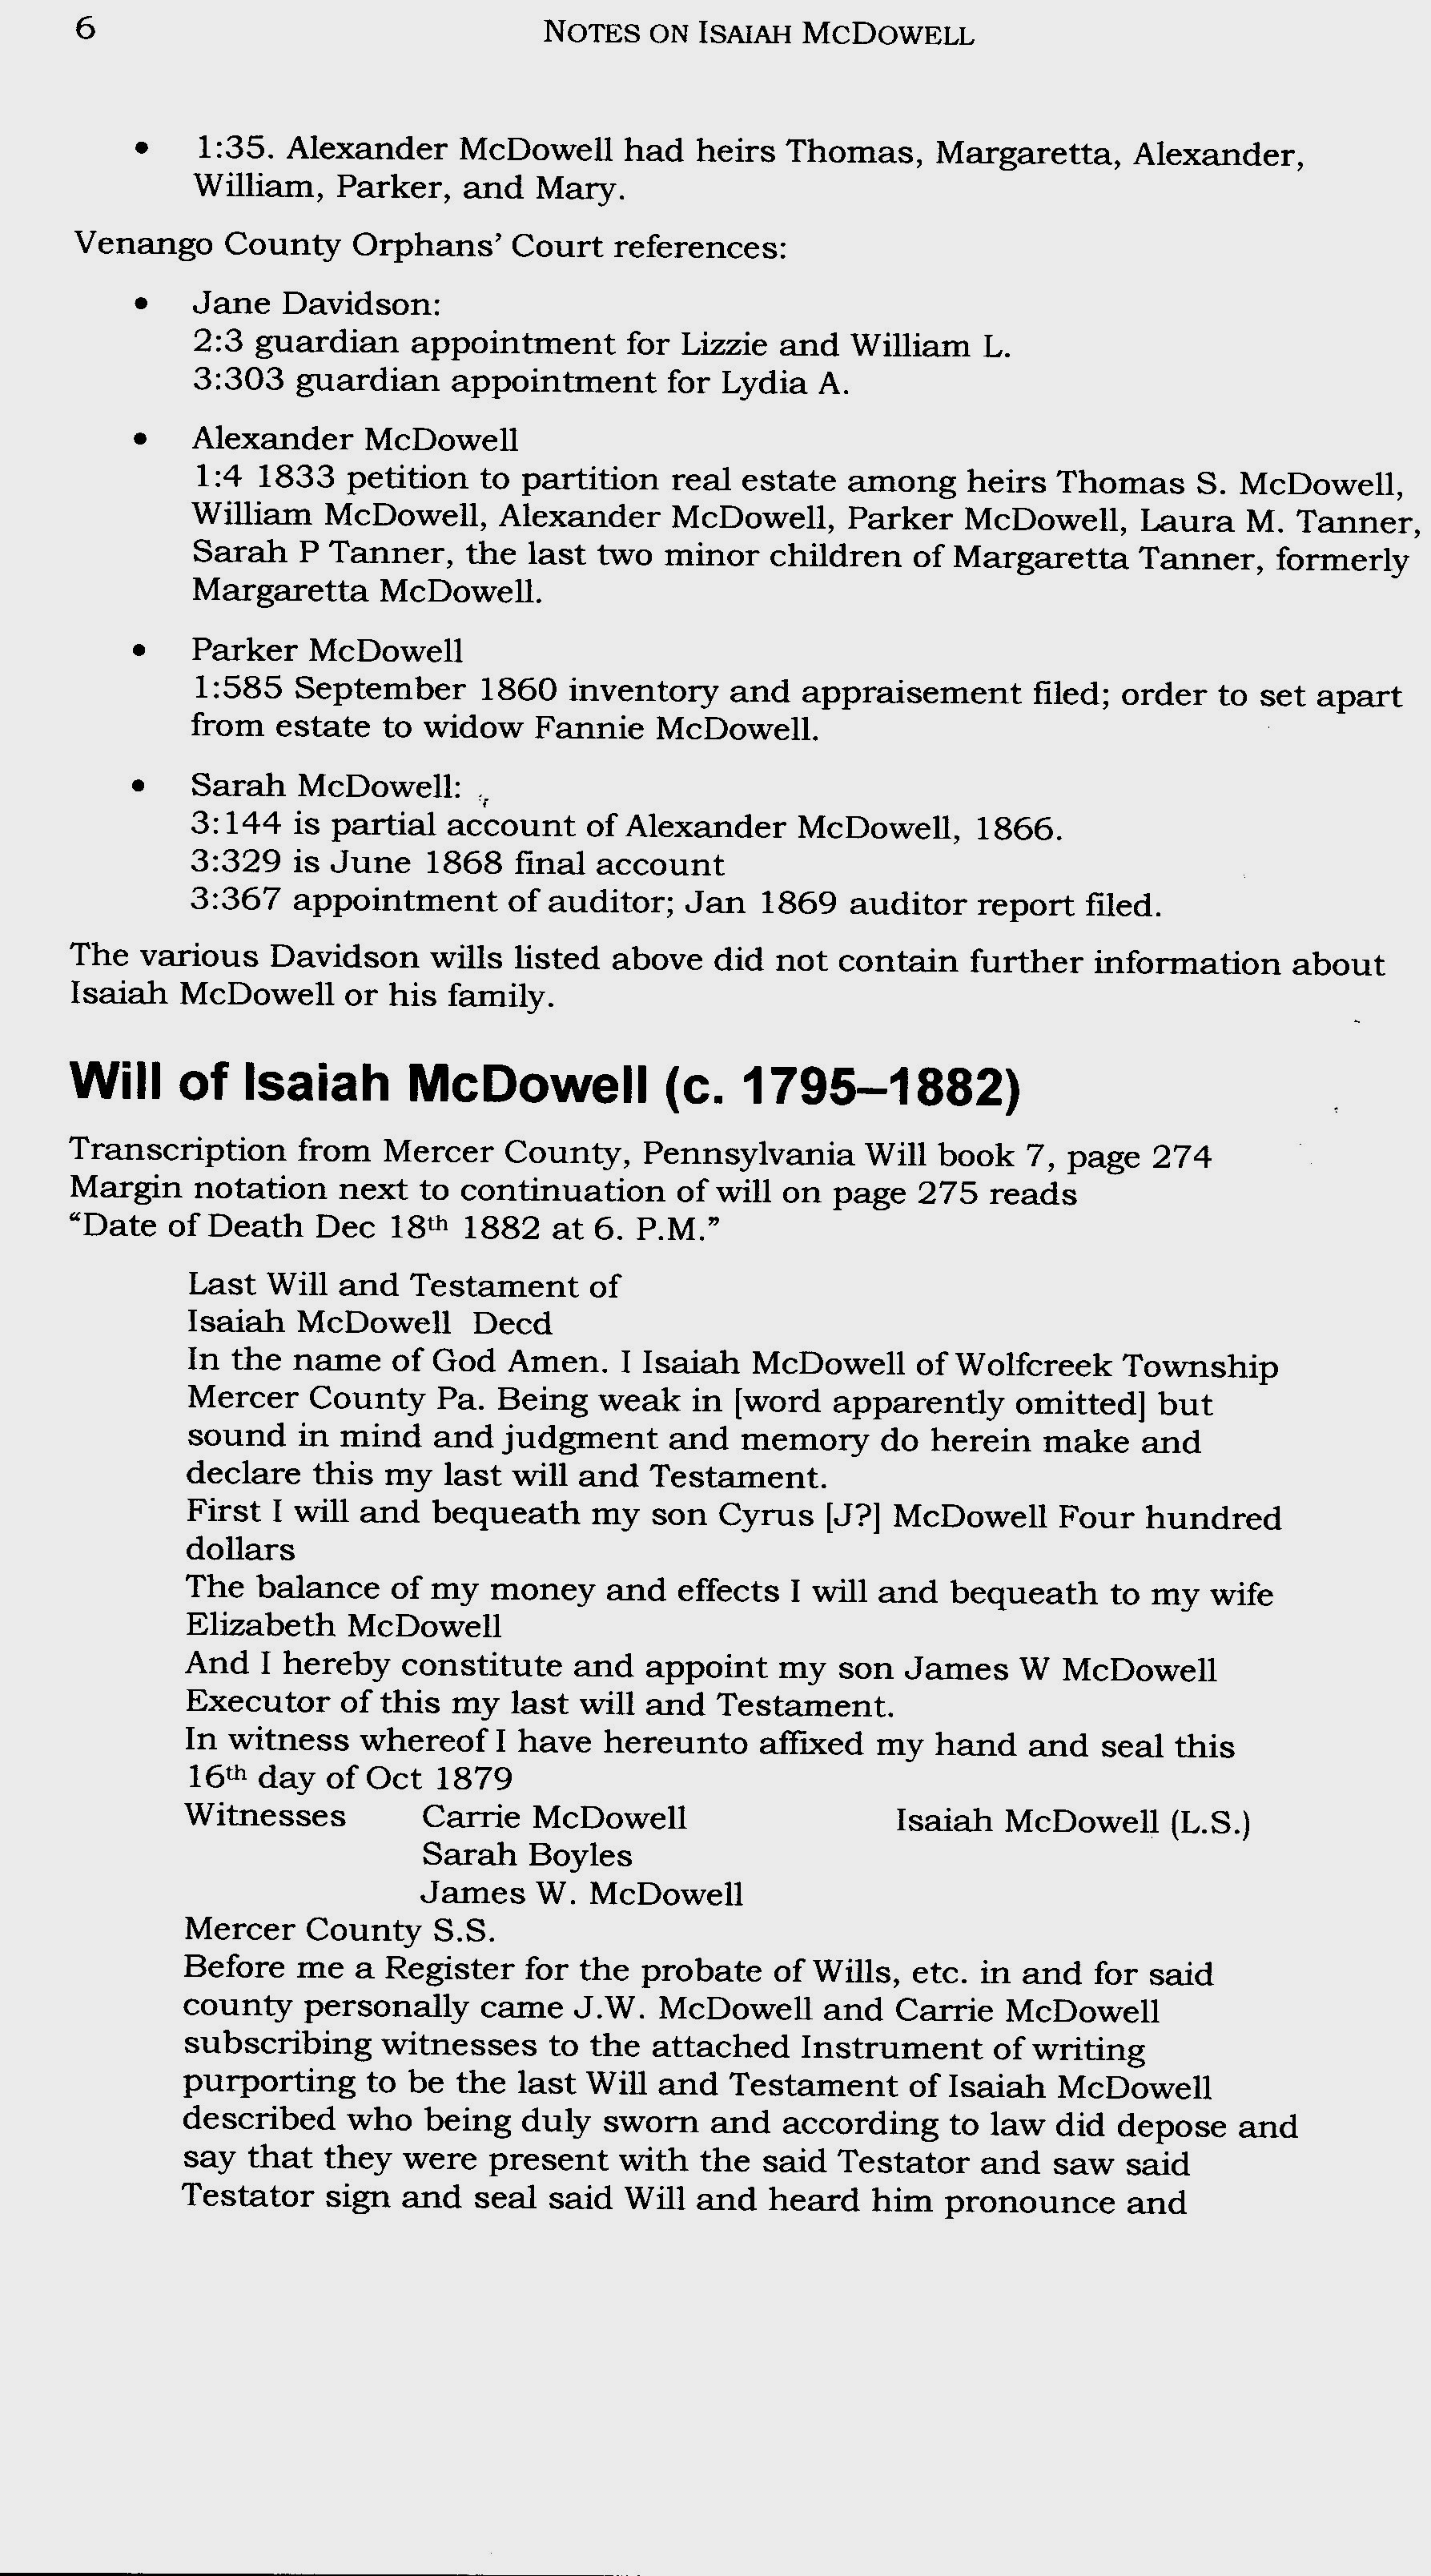 Isaiah McDowell